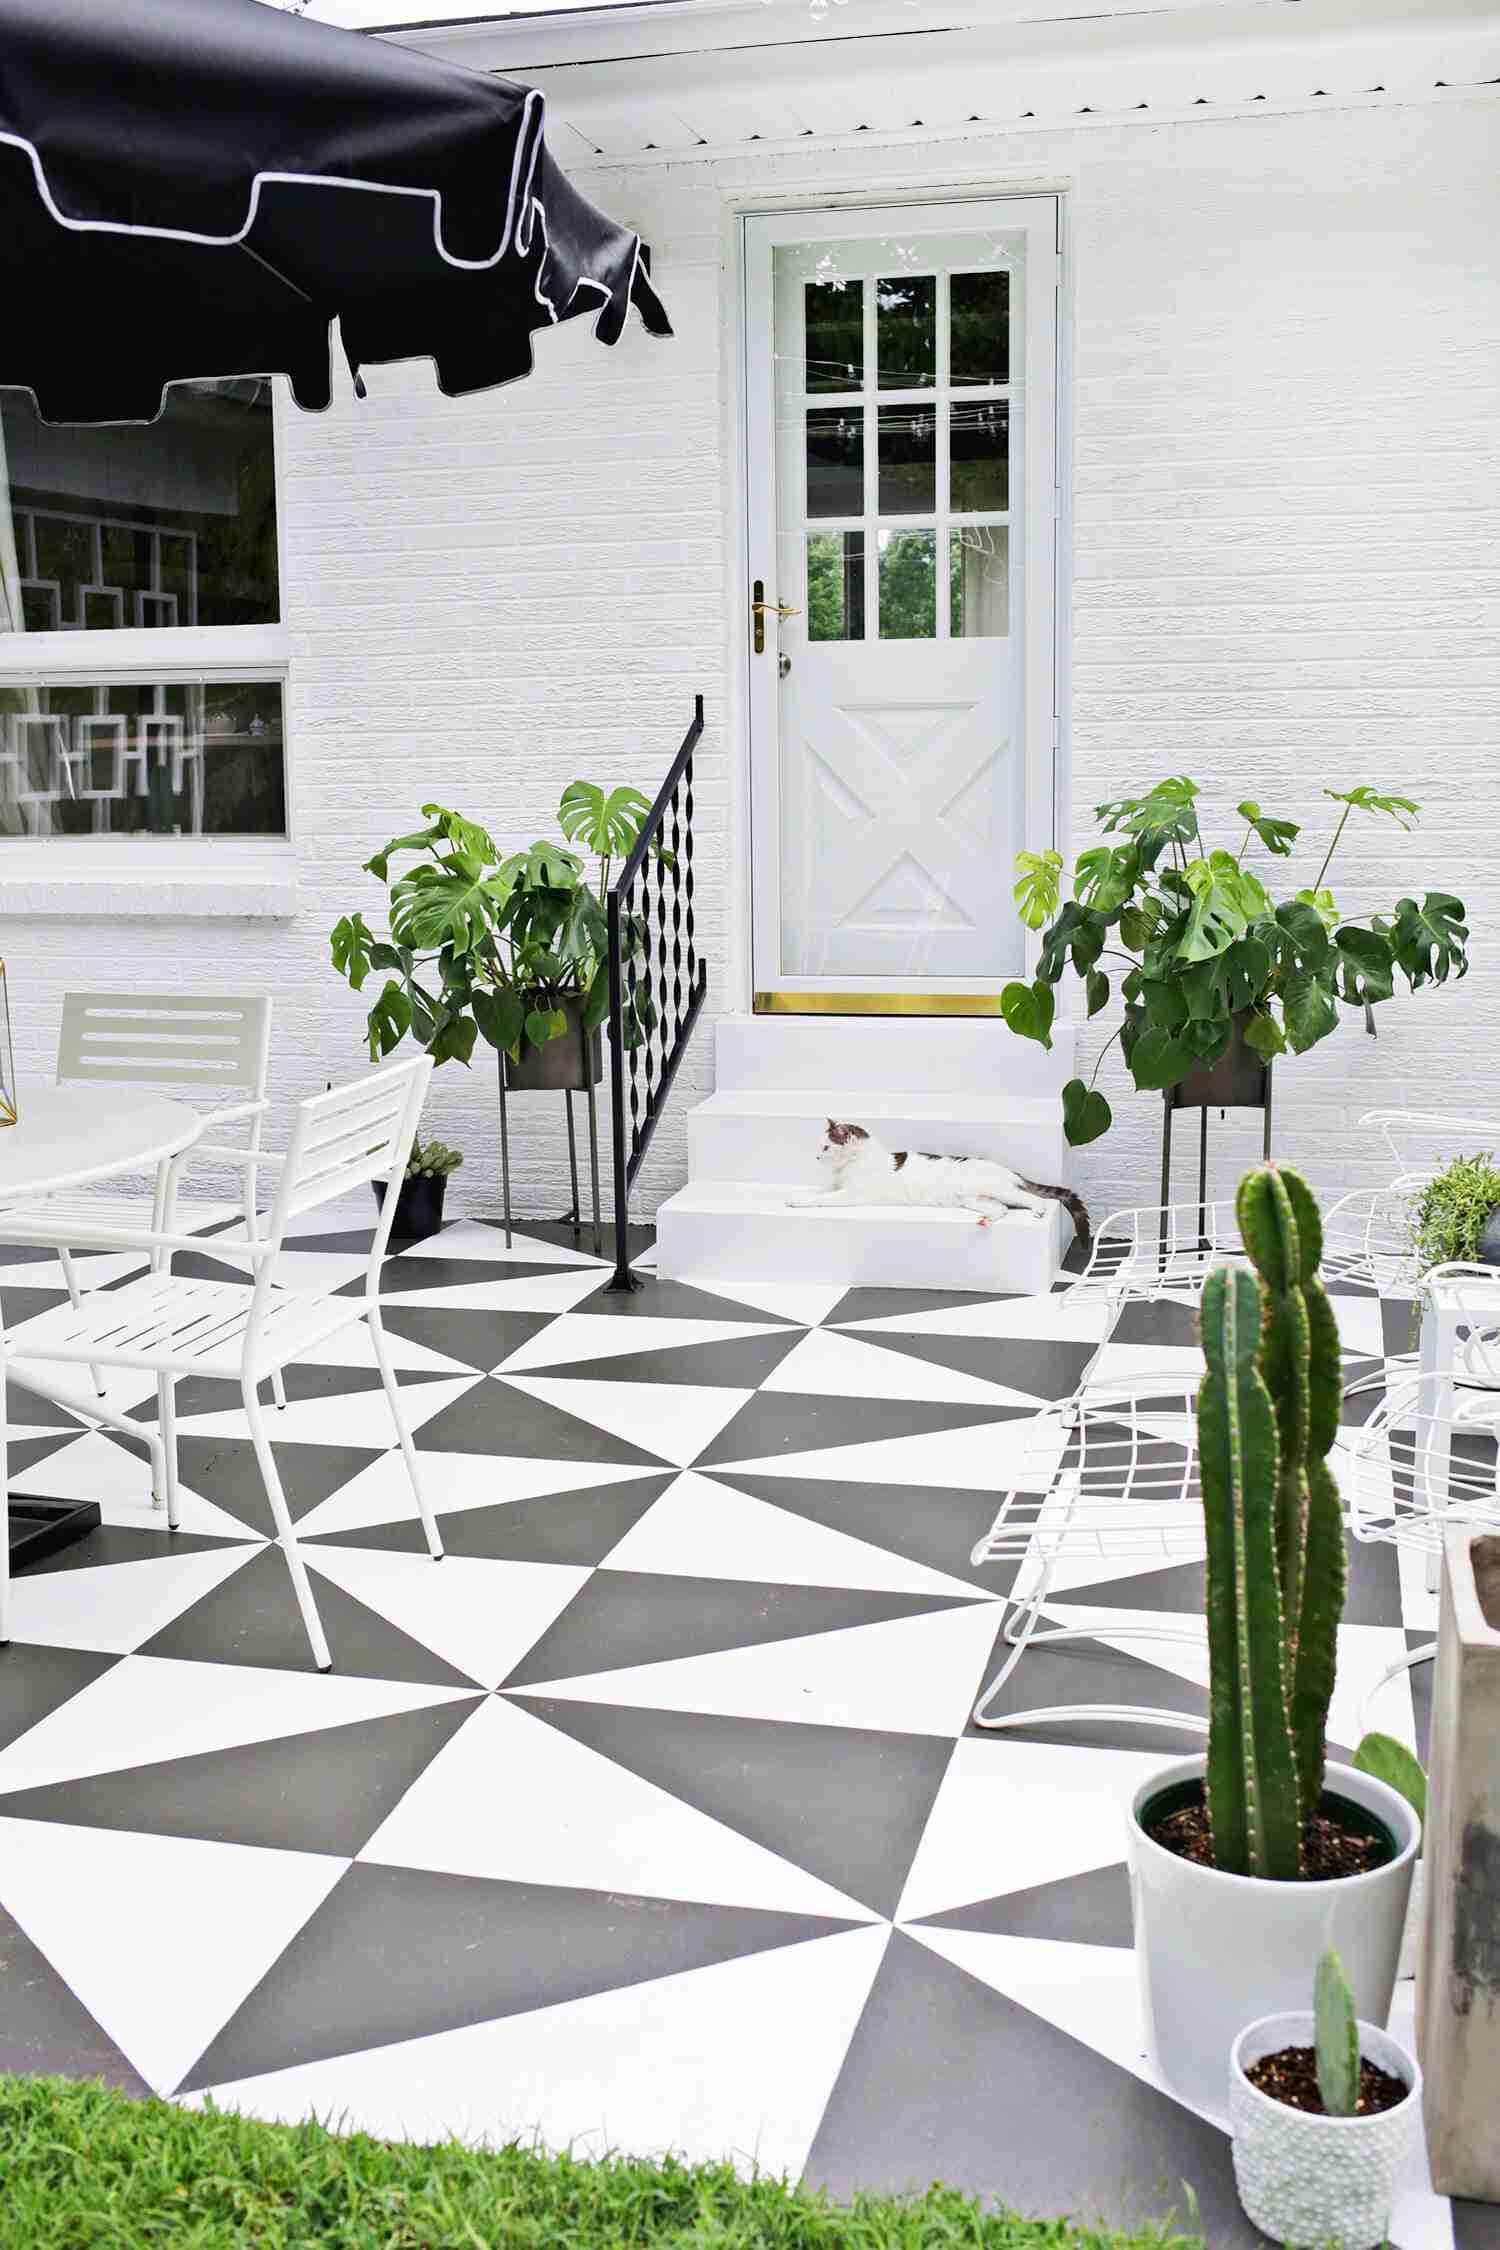 DIY Painted Patio Tiles